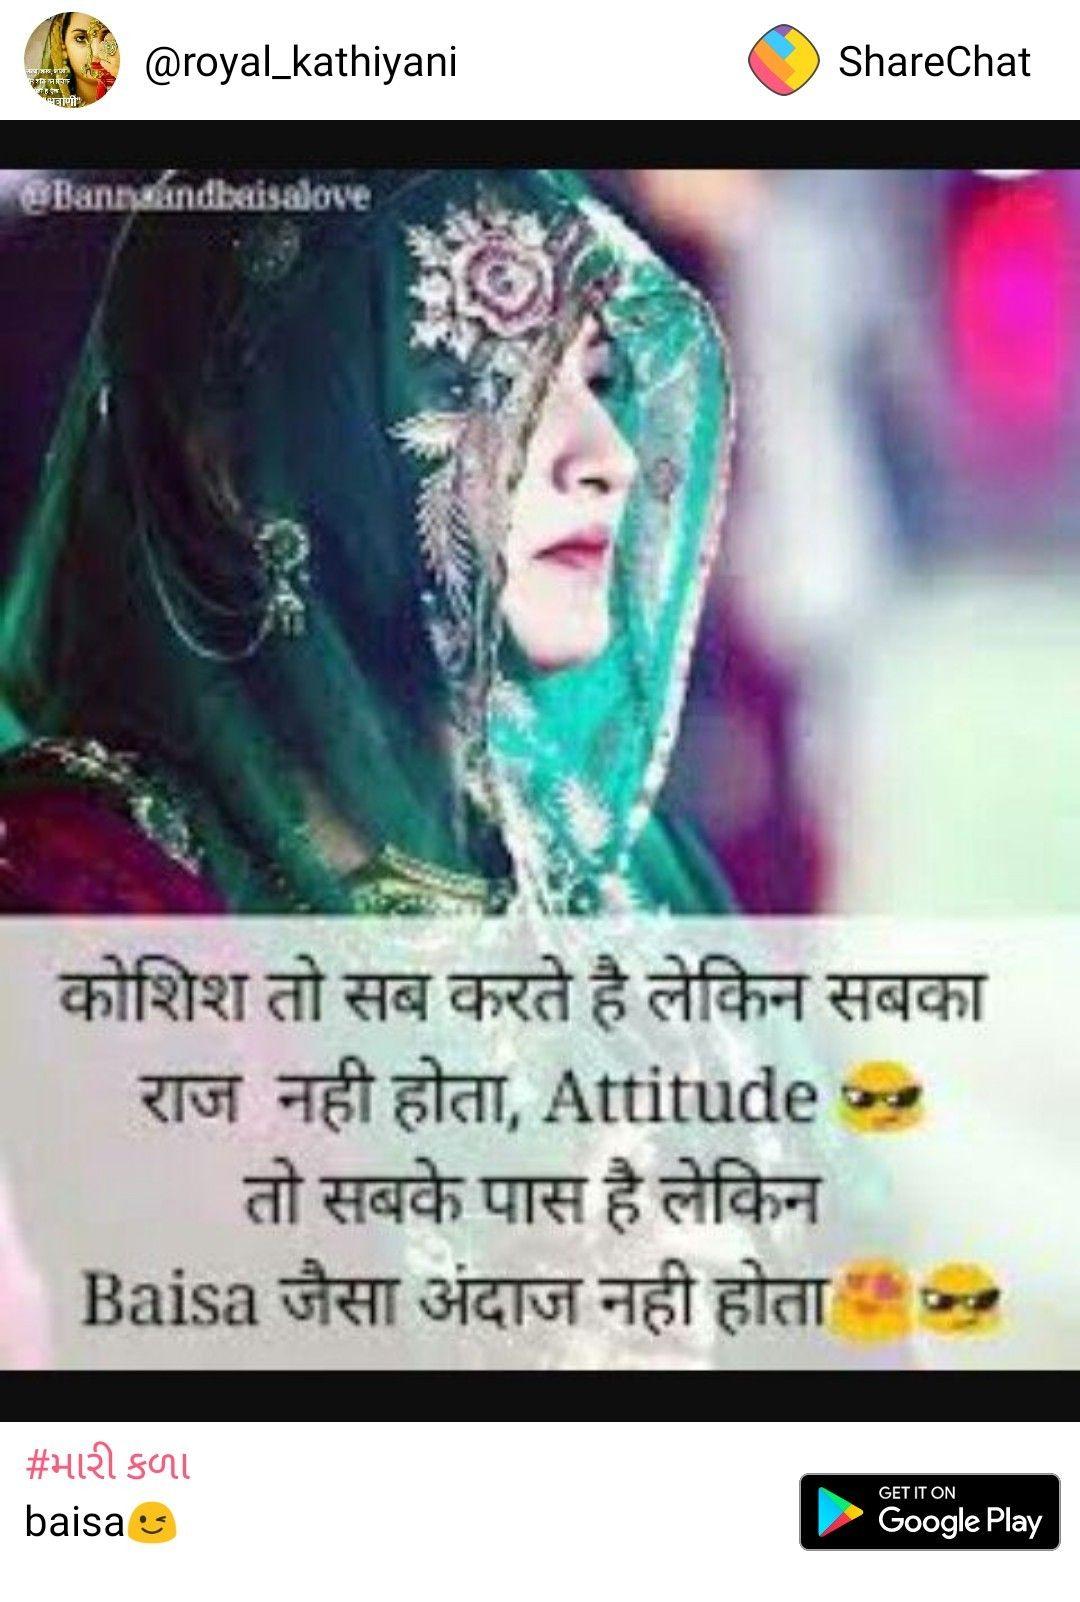 Rajputana Baisa Attitude Status 1080x1602 Wallpaper Teahub Io